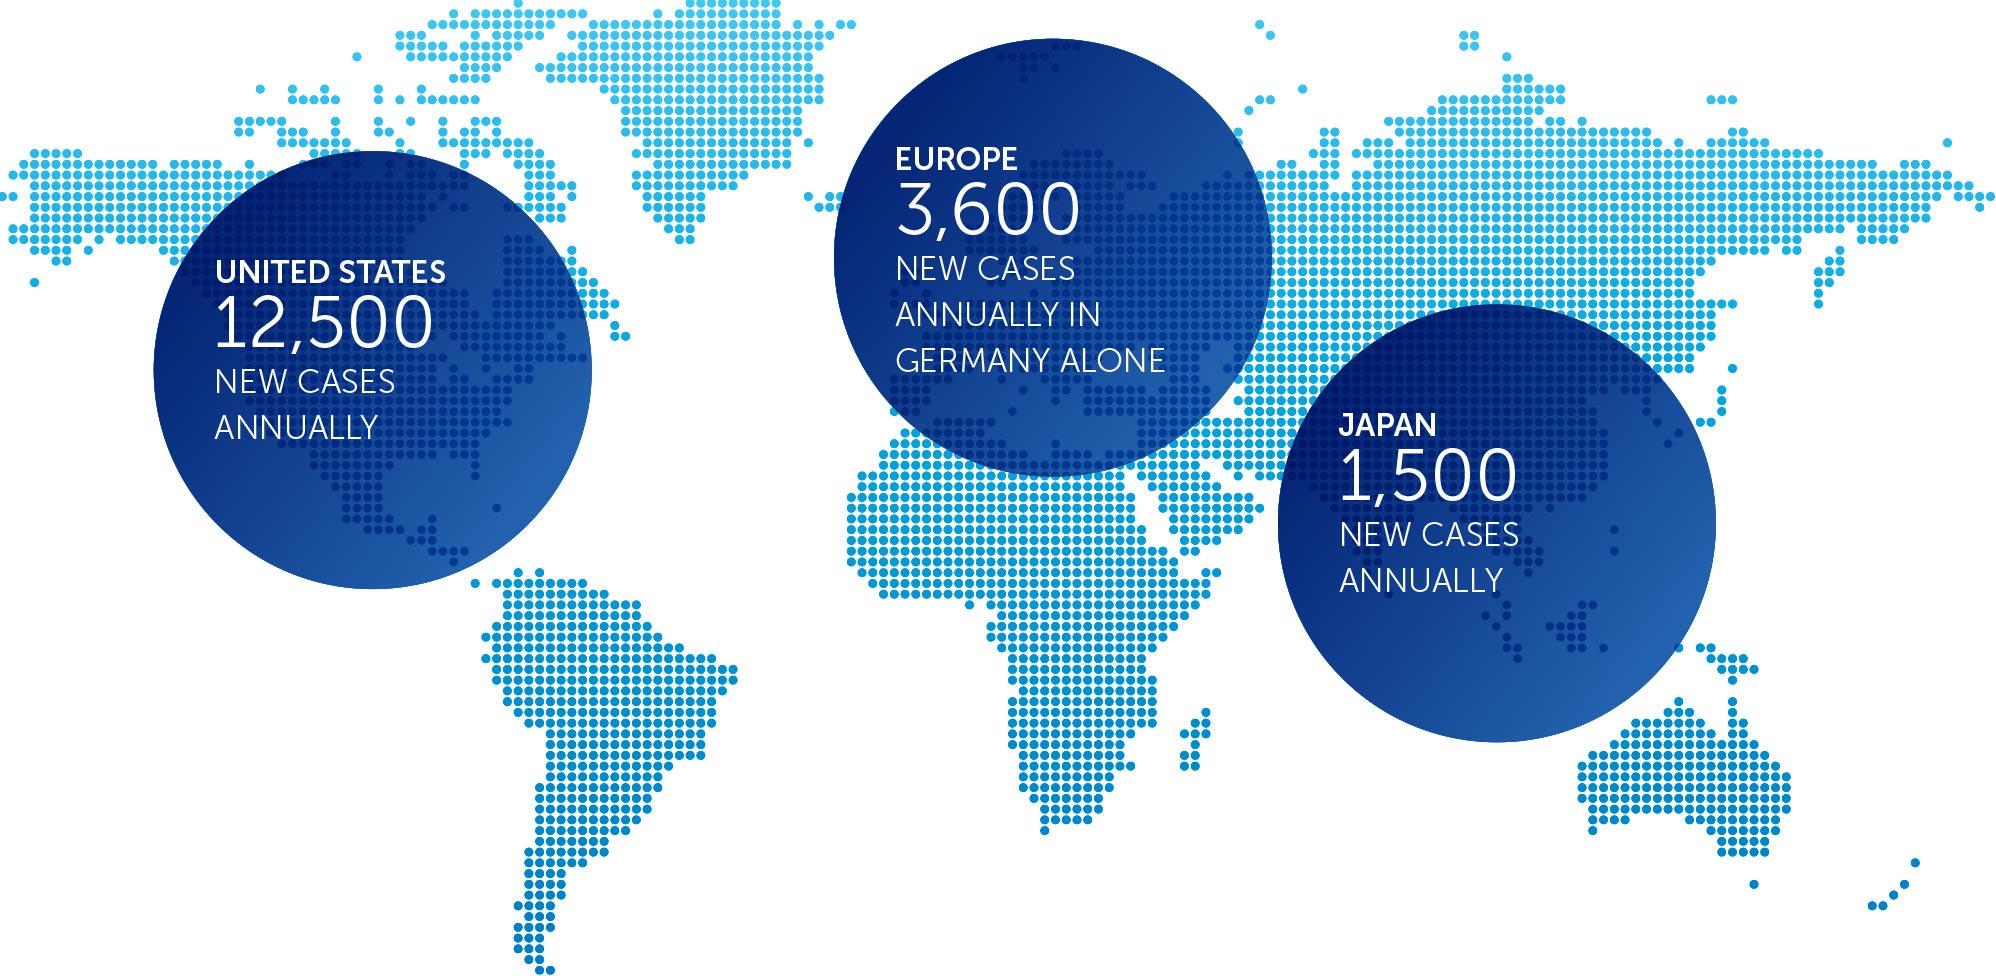 Novocure 2016 Annual Report